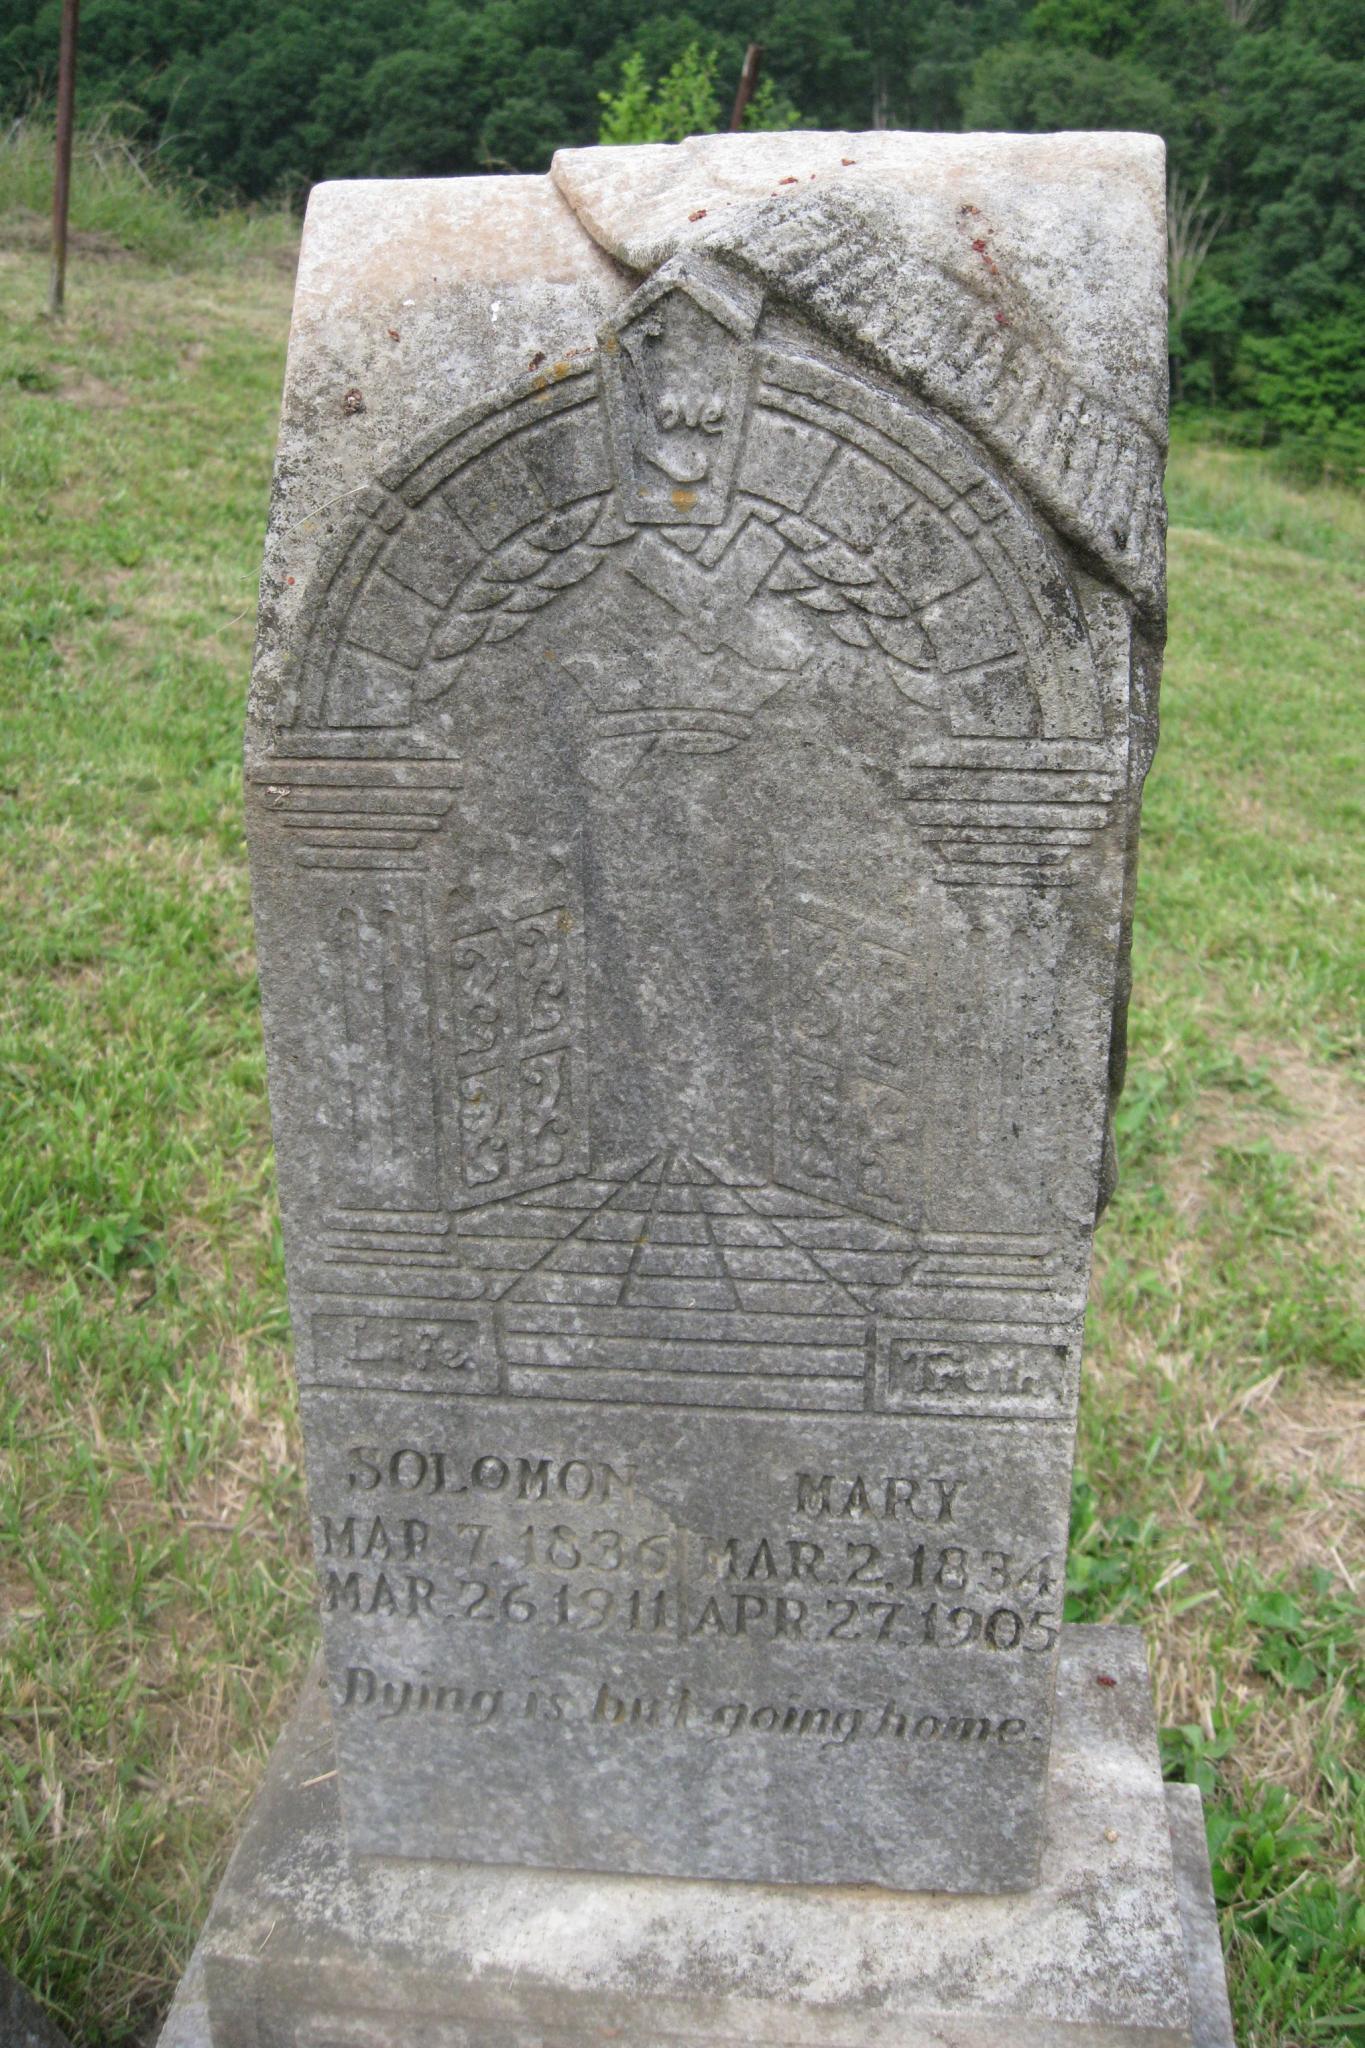 Solomon and Mary Salyers headstone